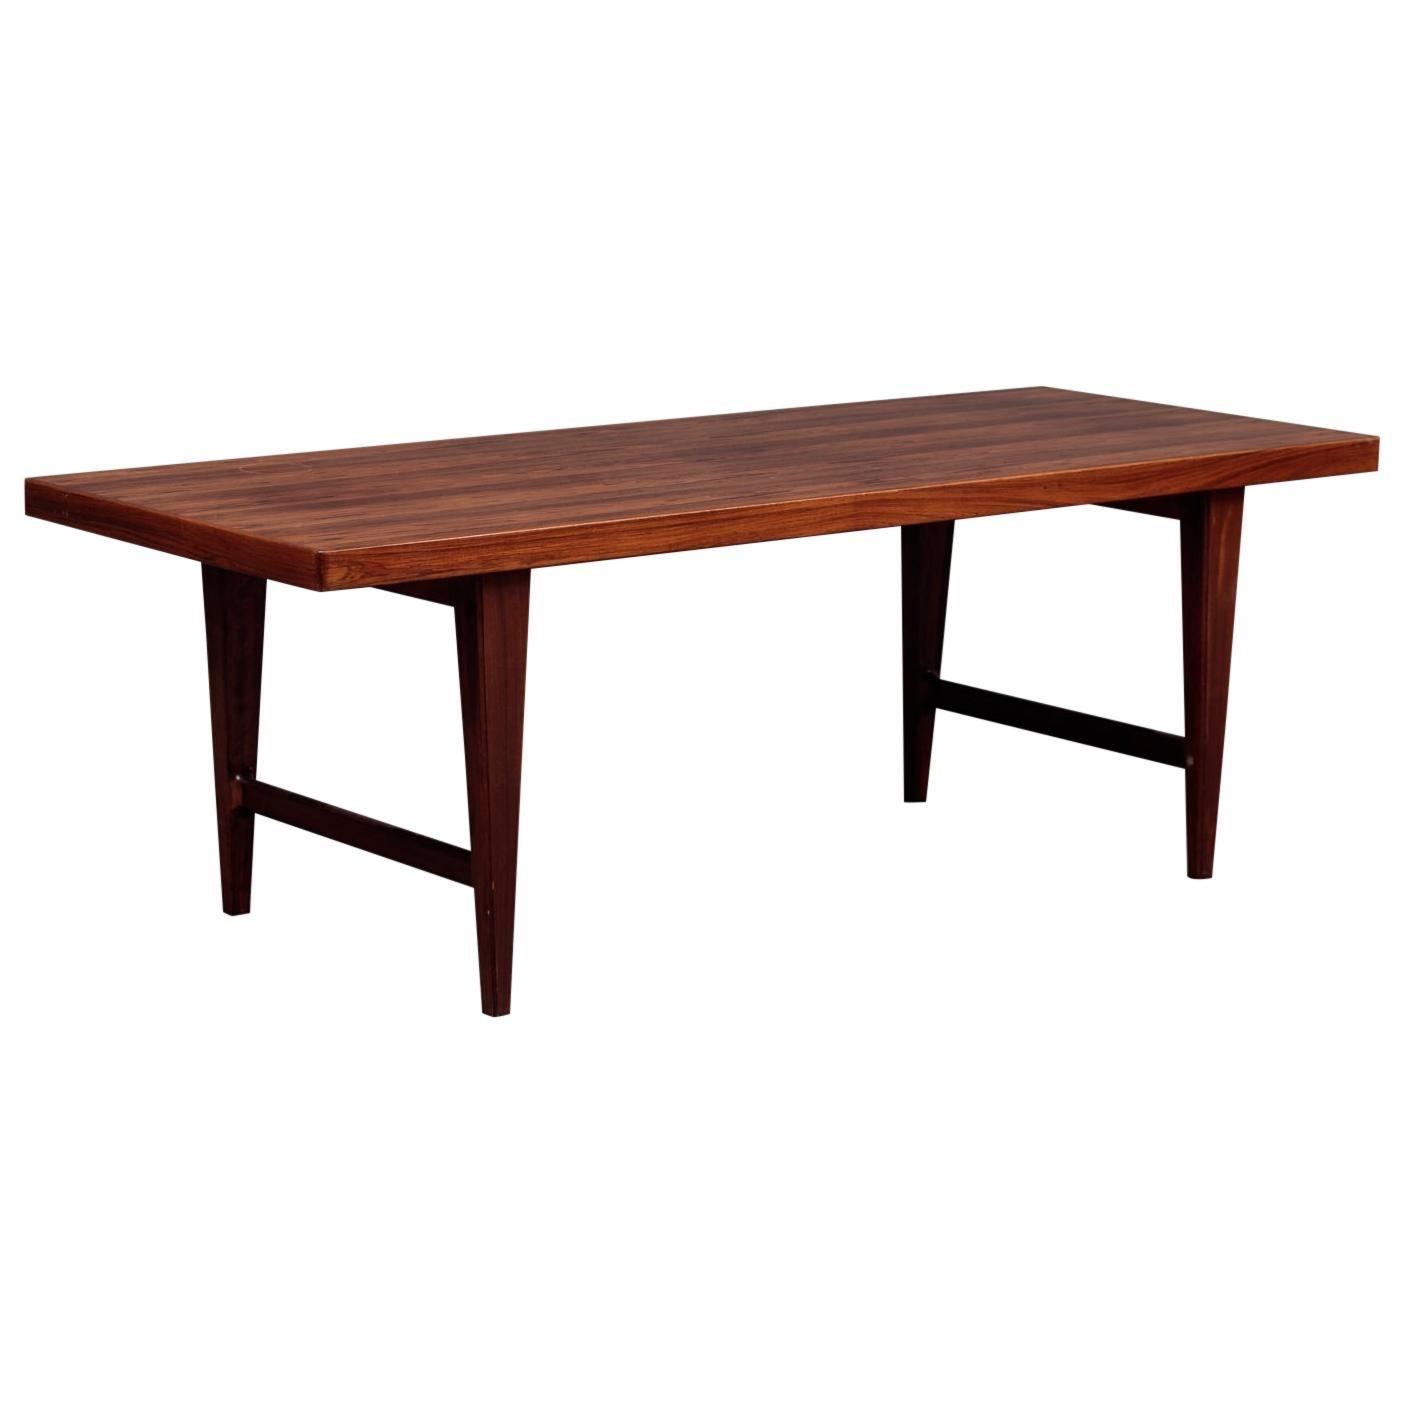 Danish Modern Mid-Century Rosewood Coffee Table